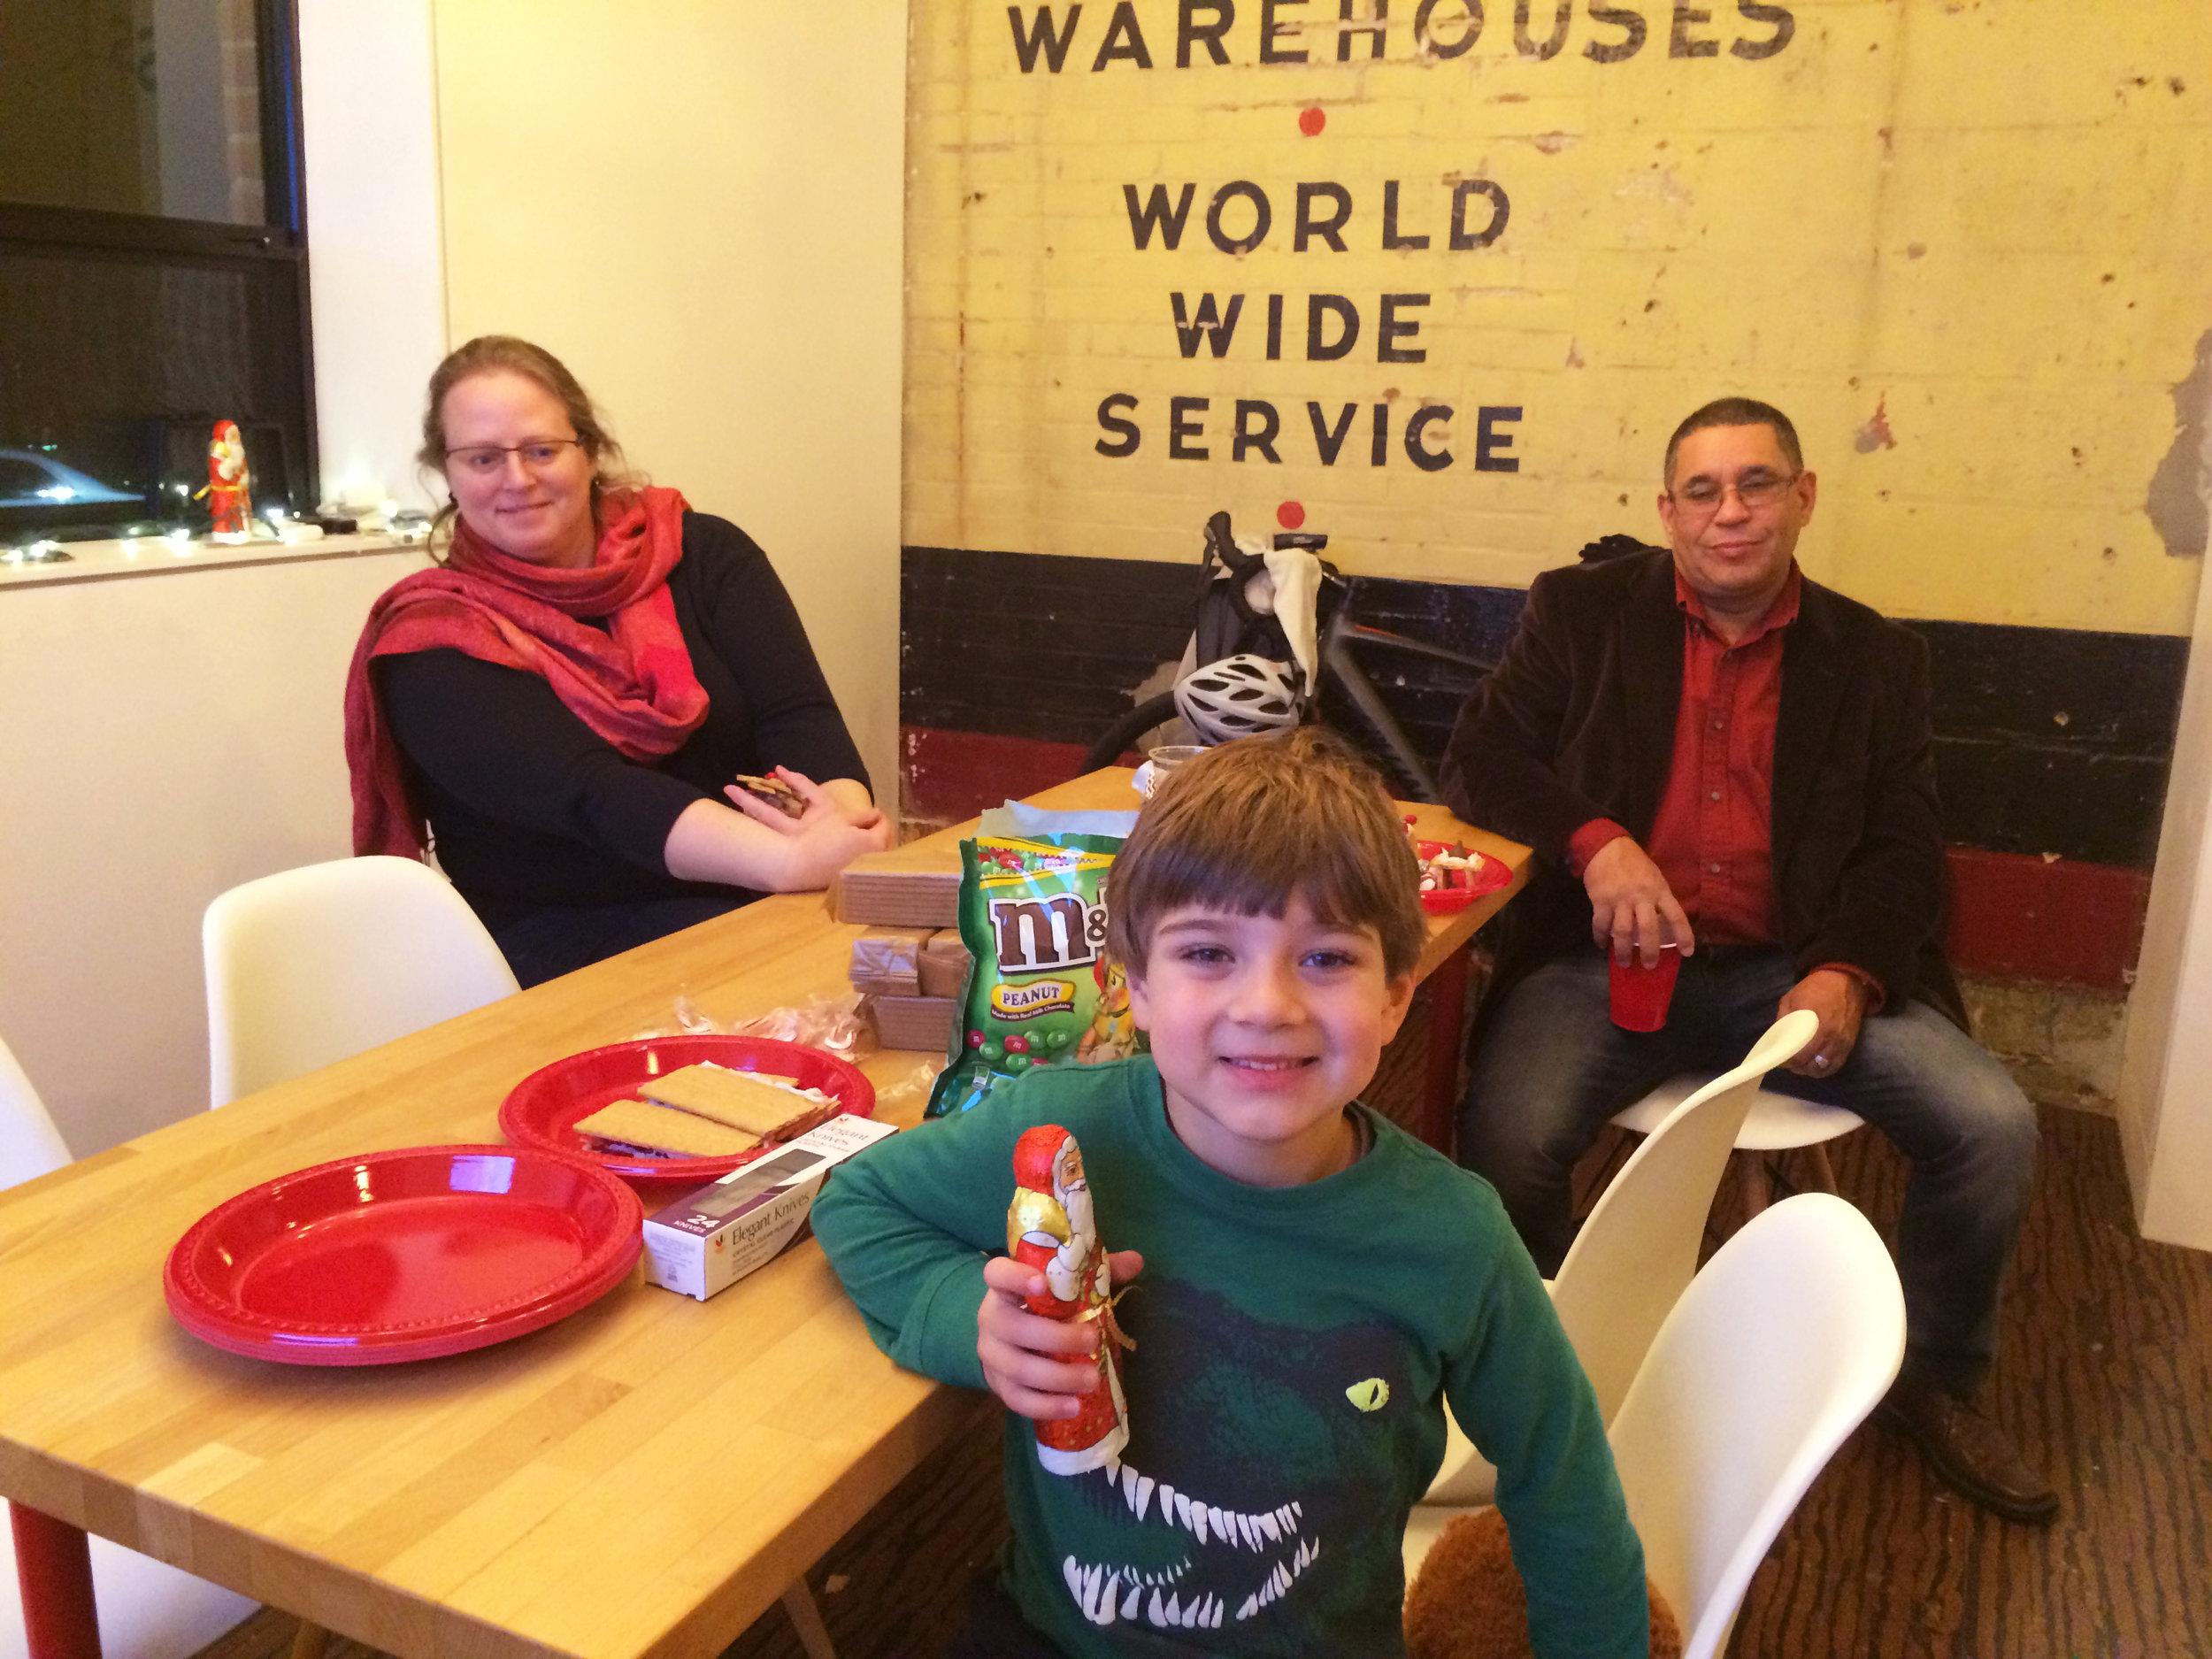 Noah, age 5, awarded chocolate Santa